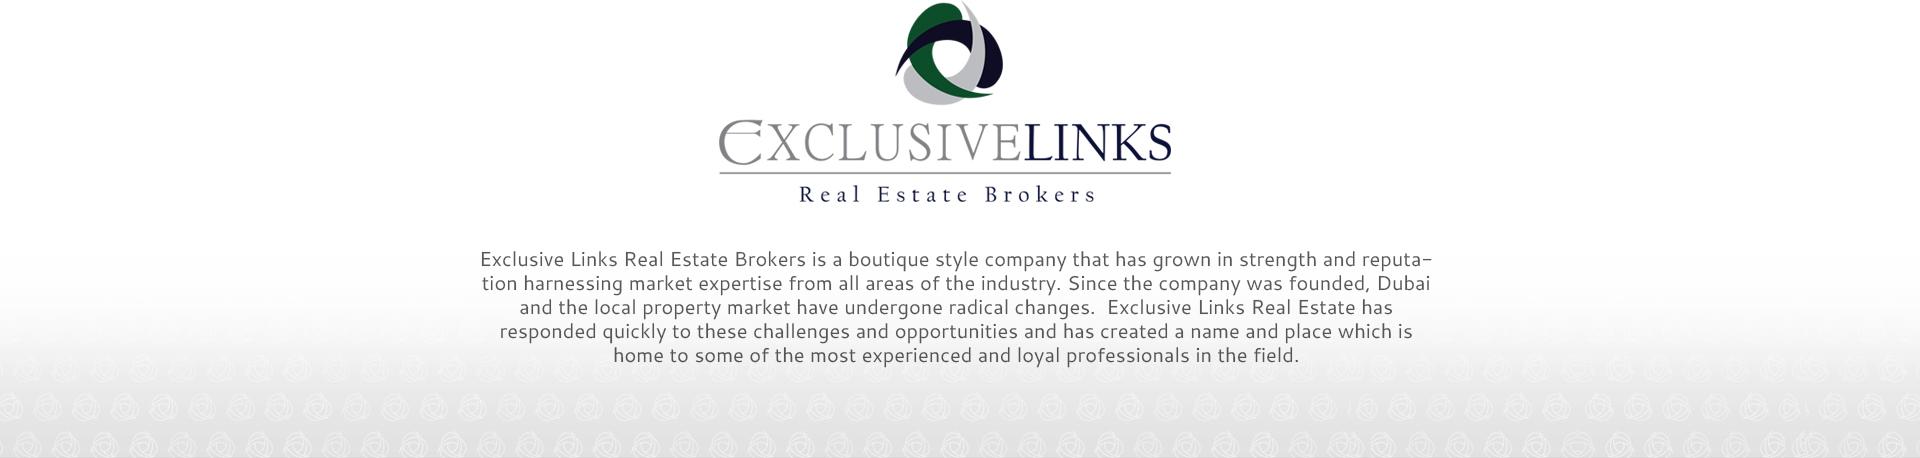 exclusive-links